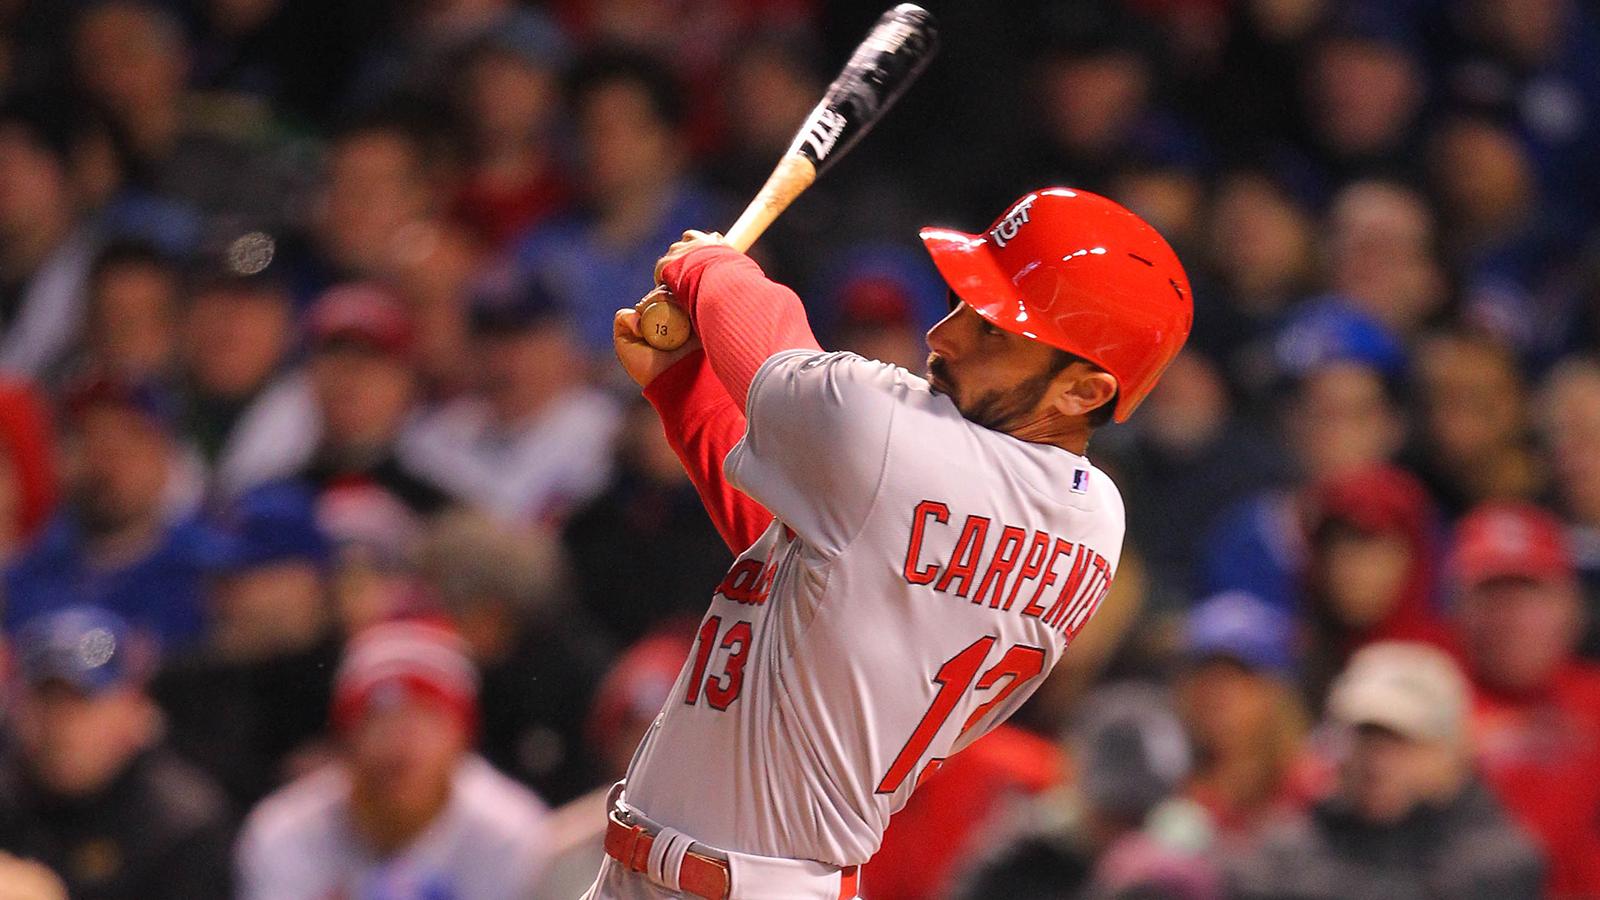 Matt Carpenter The 2015 Cardinals MVP Dose of Buffa 1600x900